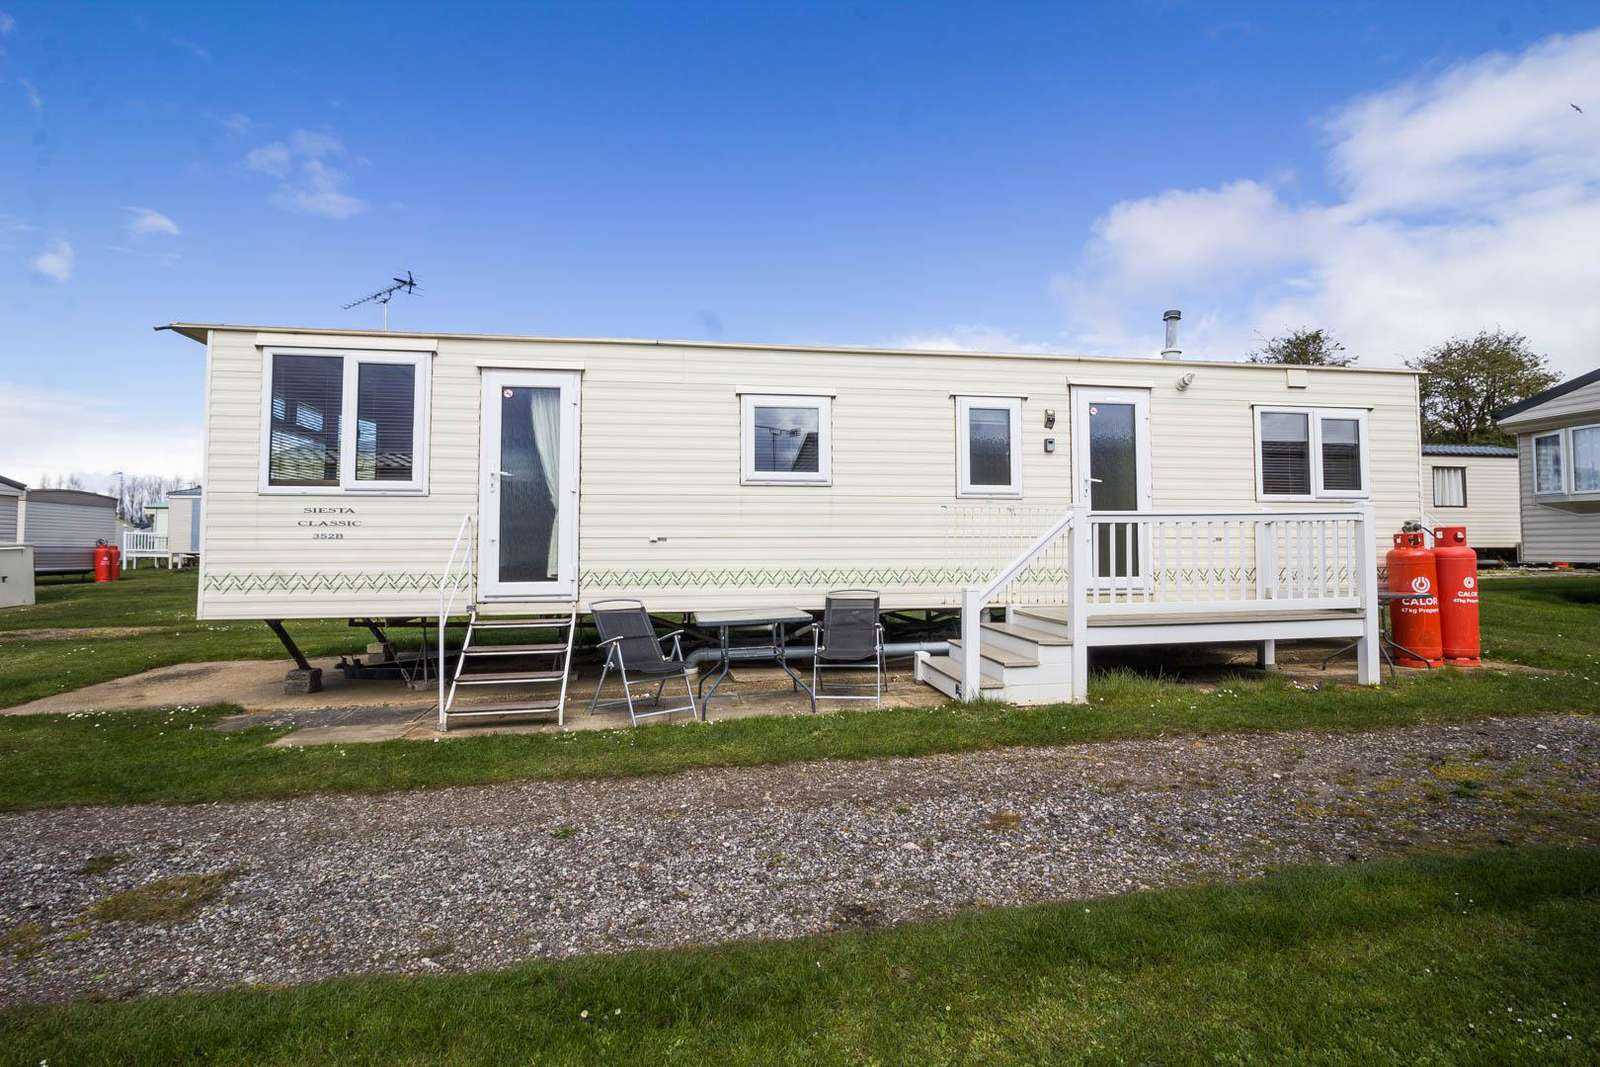 23038S – Sandringham area, 2 bed, 6 berth caravan with C/H & D/G. Diamond rated. - property